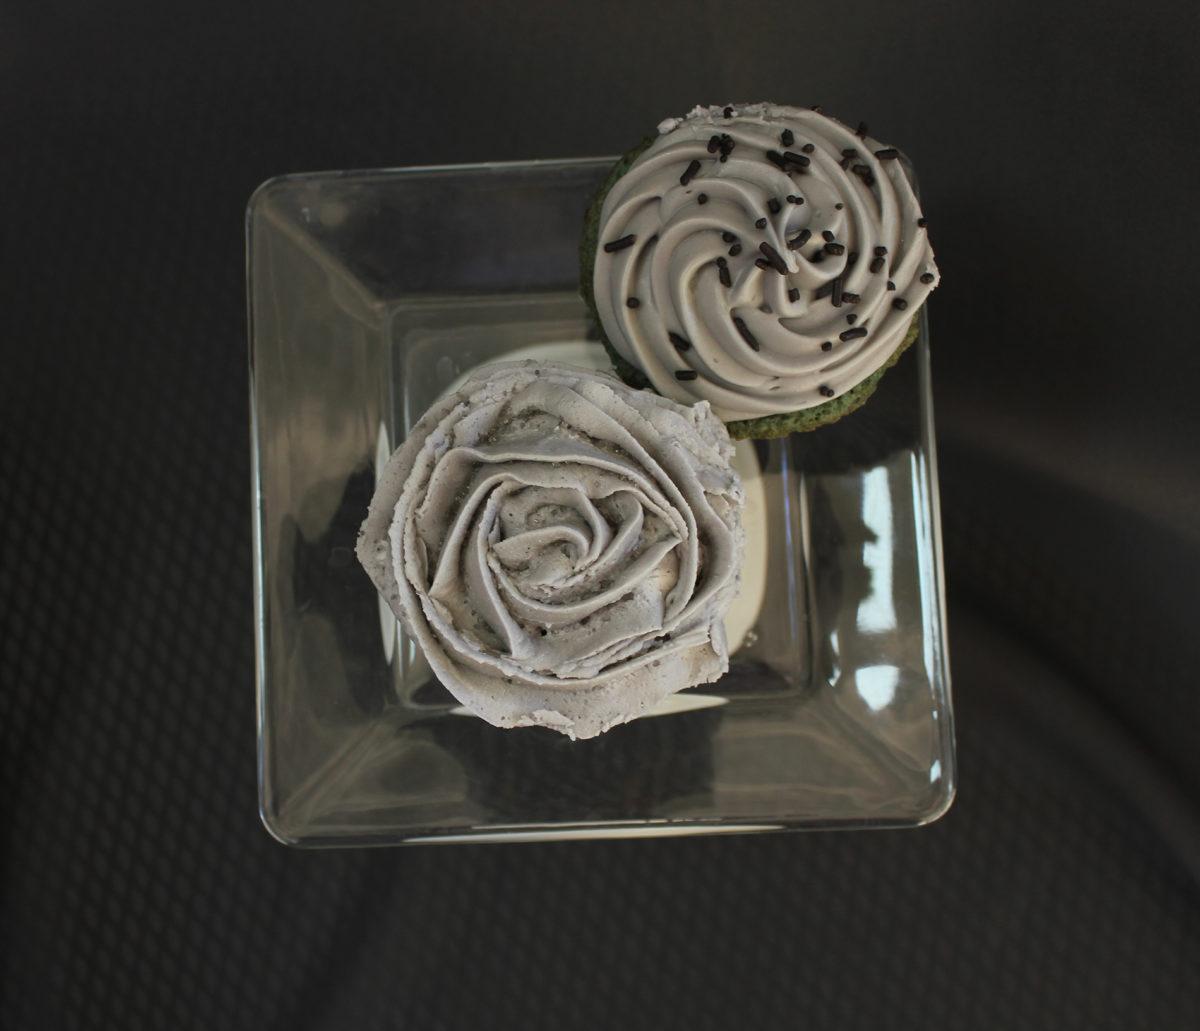 Depressed Cake cupcakes